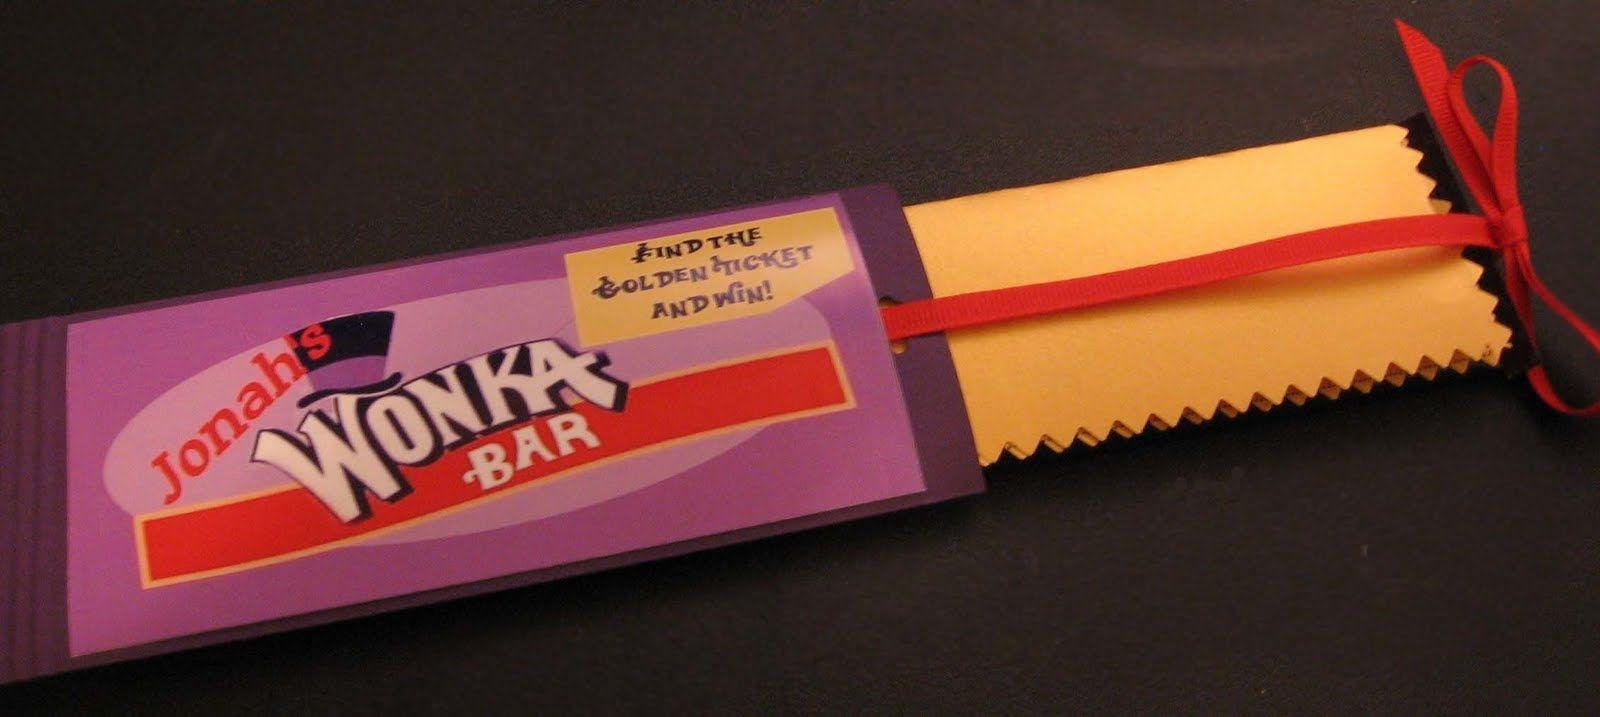 Willy Wonka Candy Bar Wrapper Template | Wonka Ideas | Pinterest